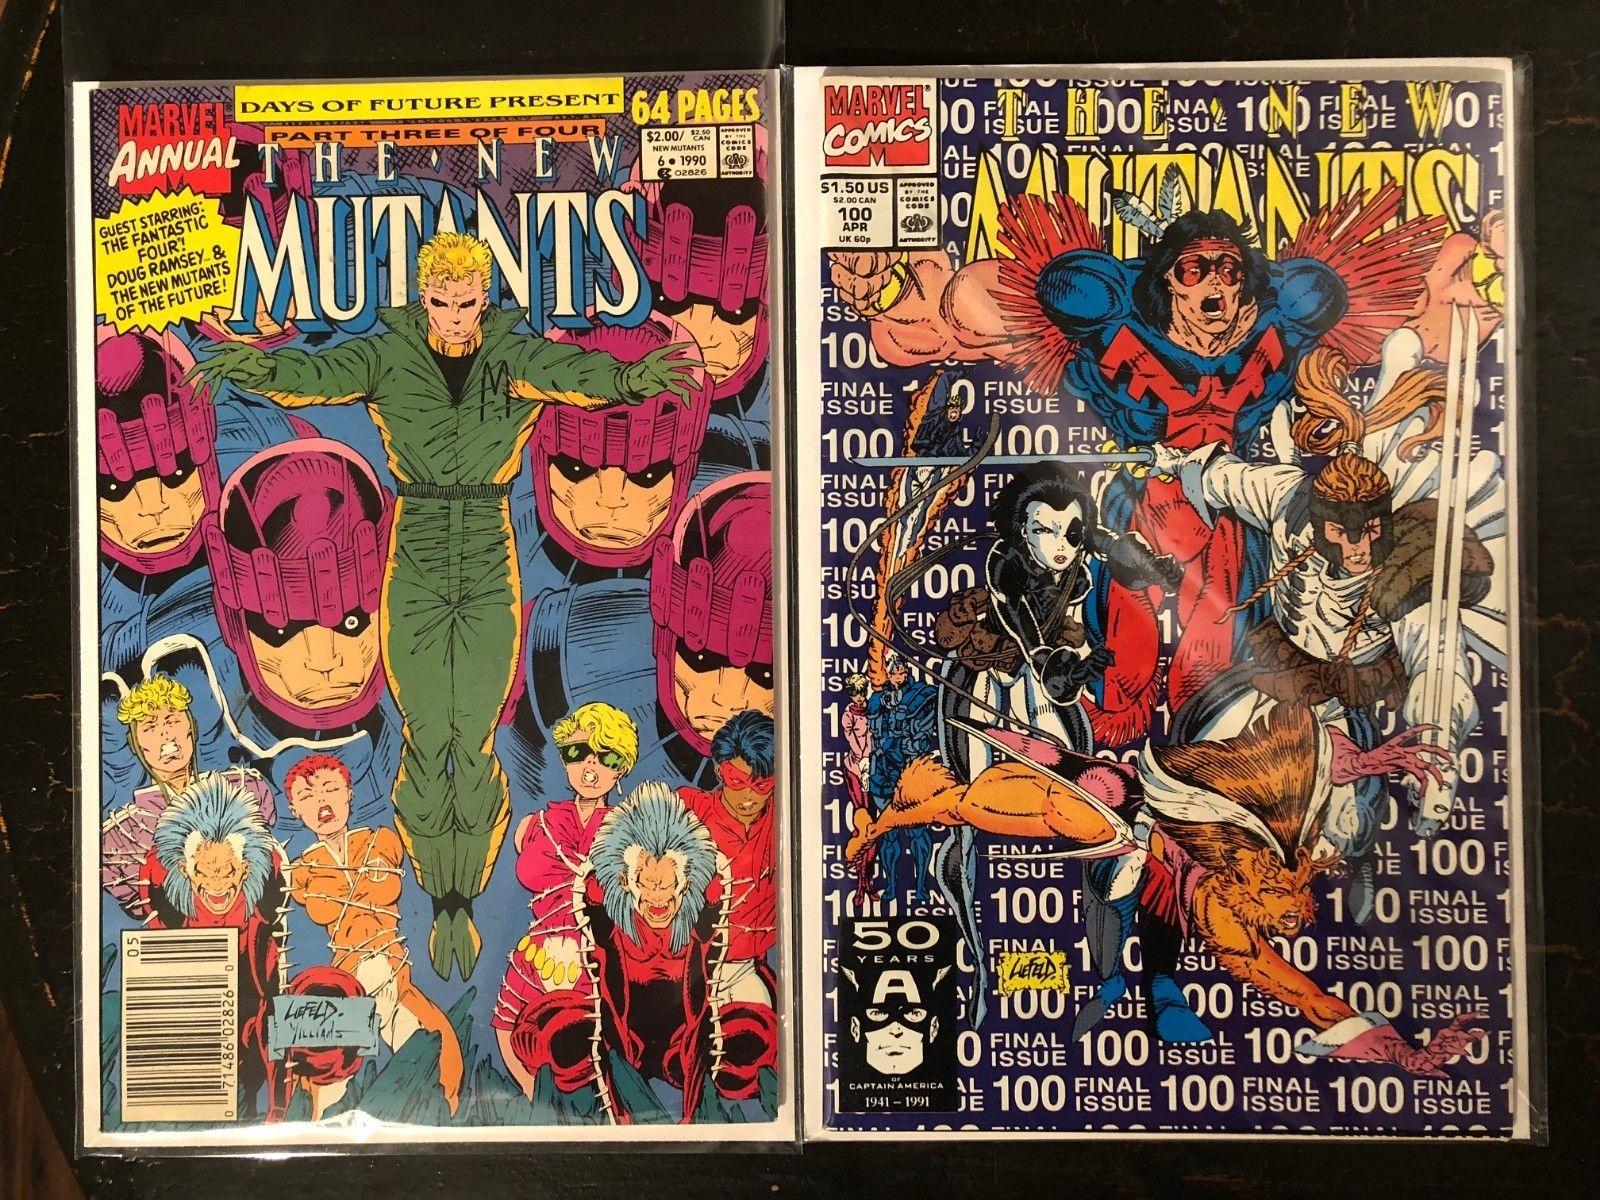 Marvel Comics New Mutants Annual #6 1984 VF//NM  1st appearance of Shatterstar